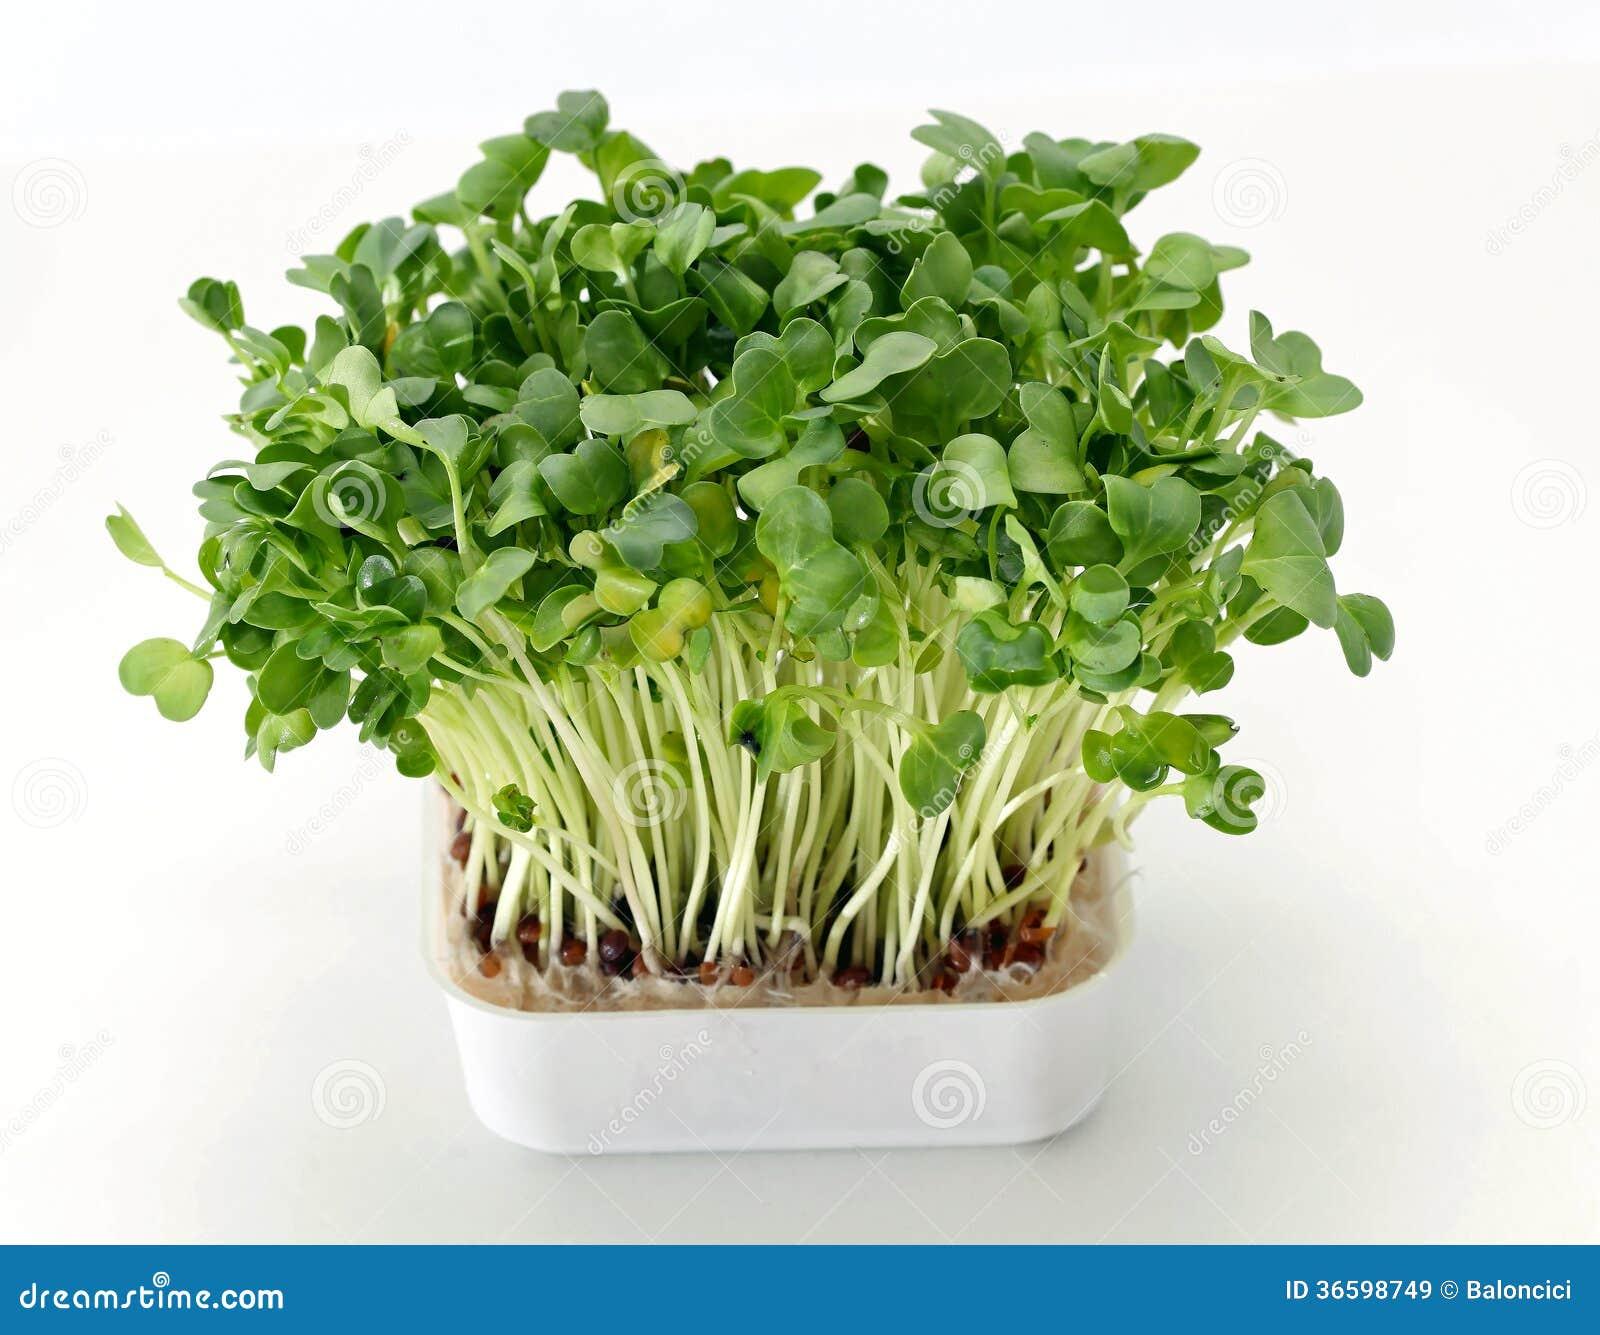 salad business plan